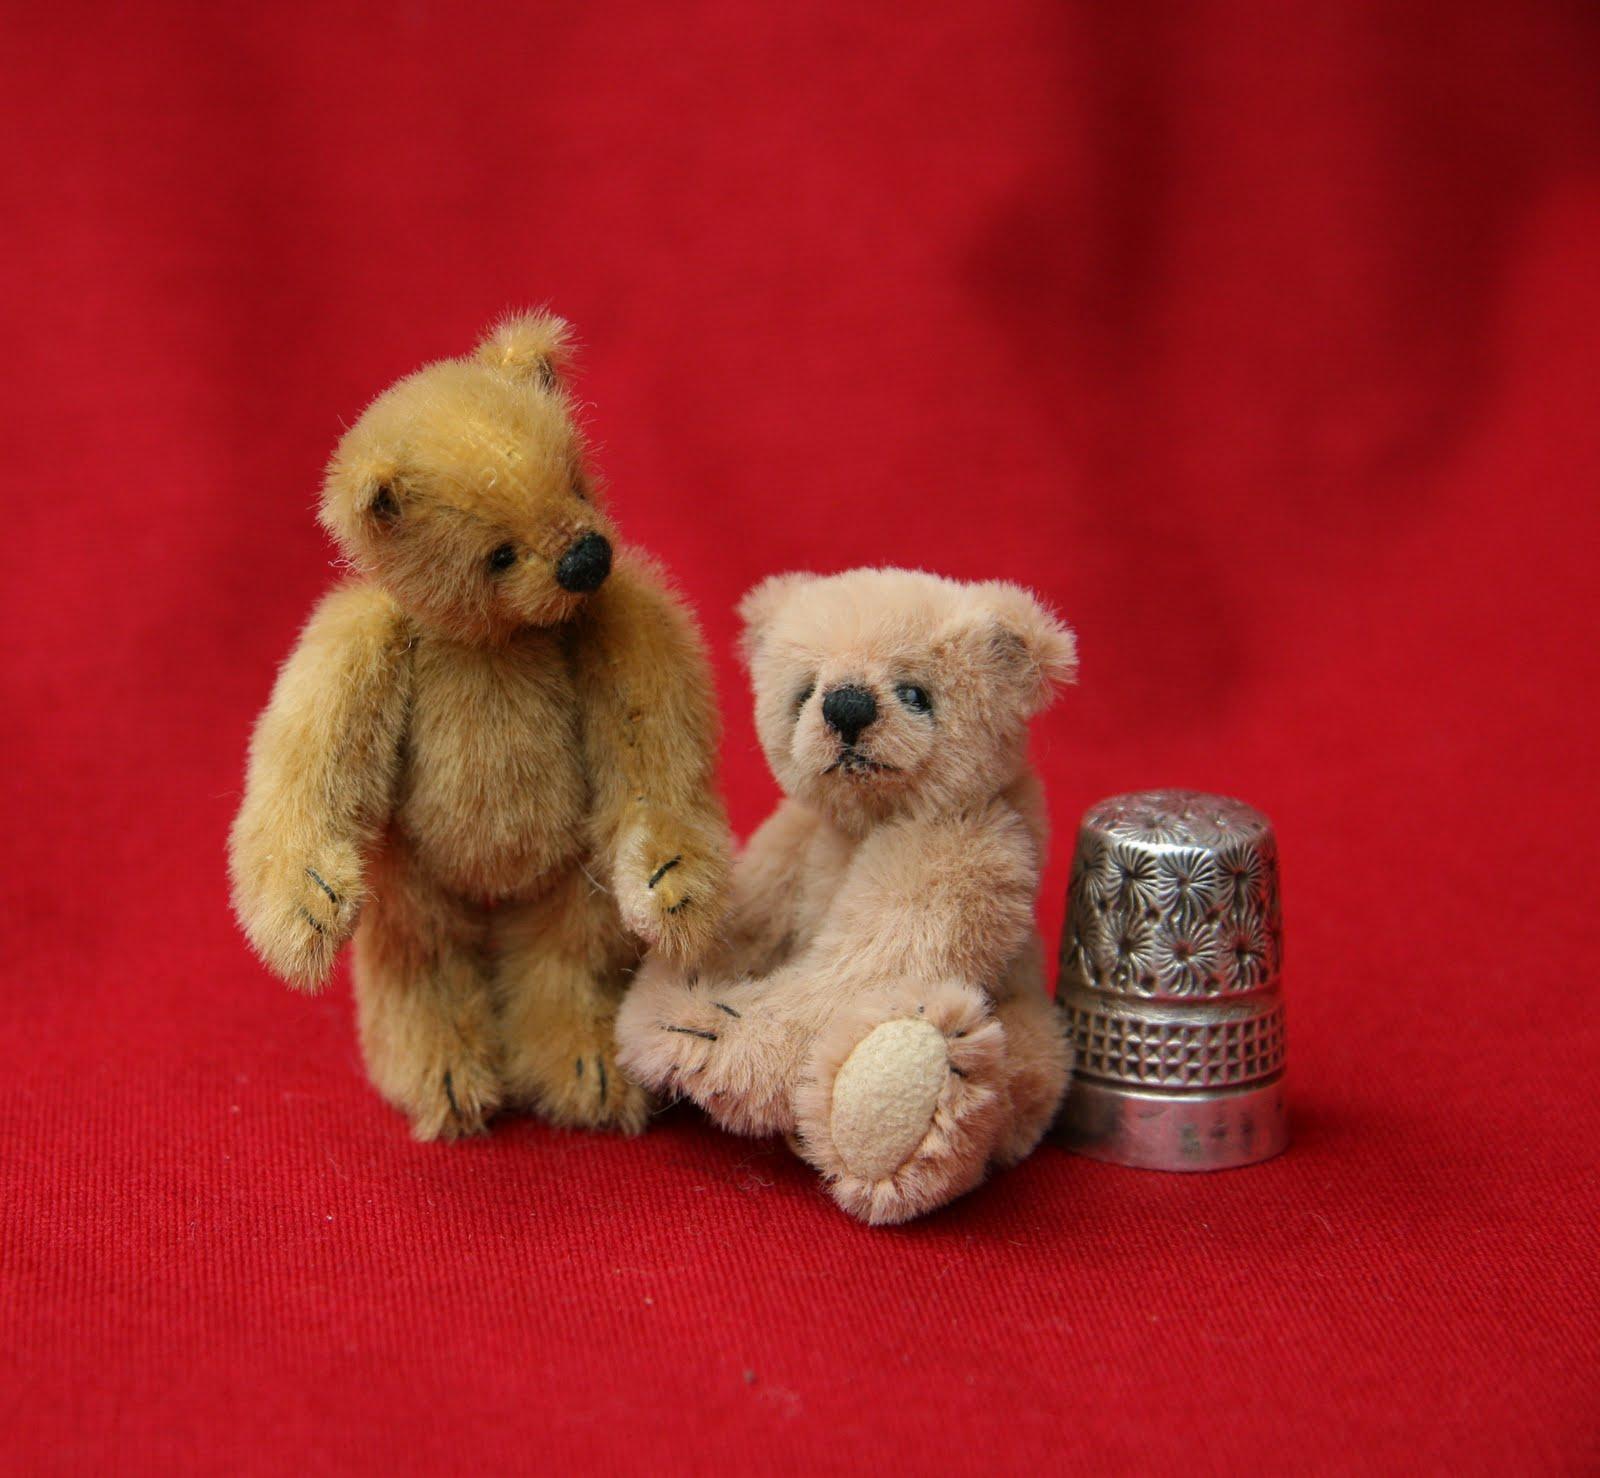 bears)